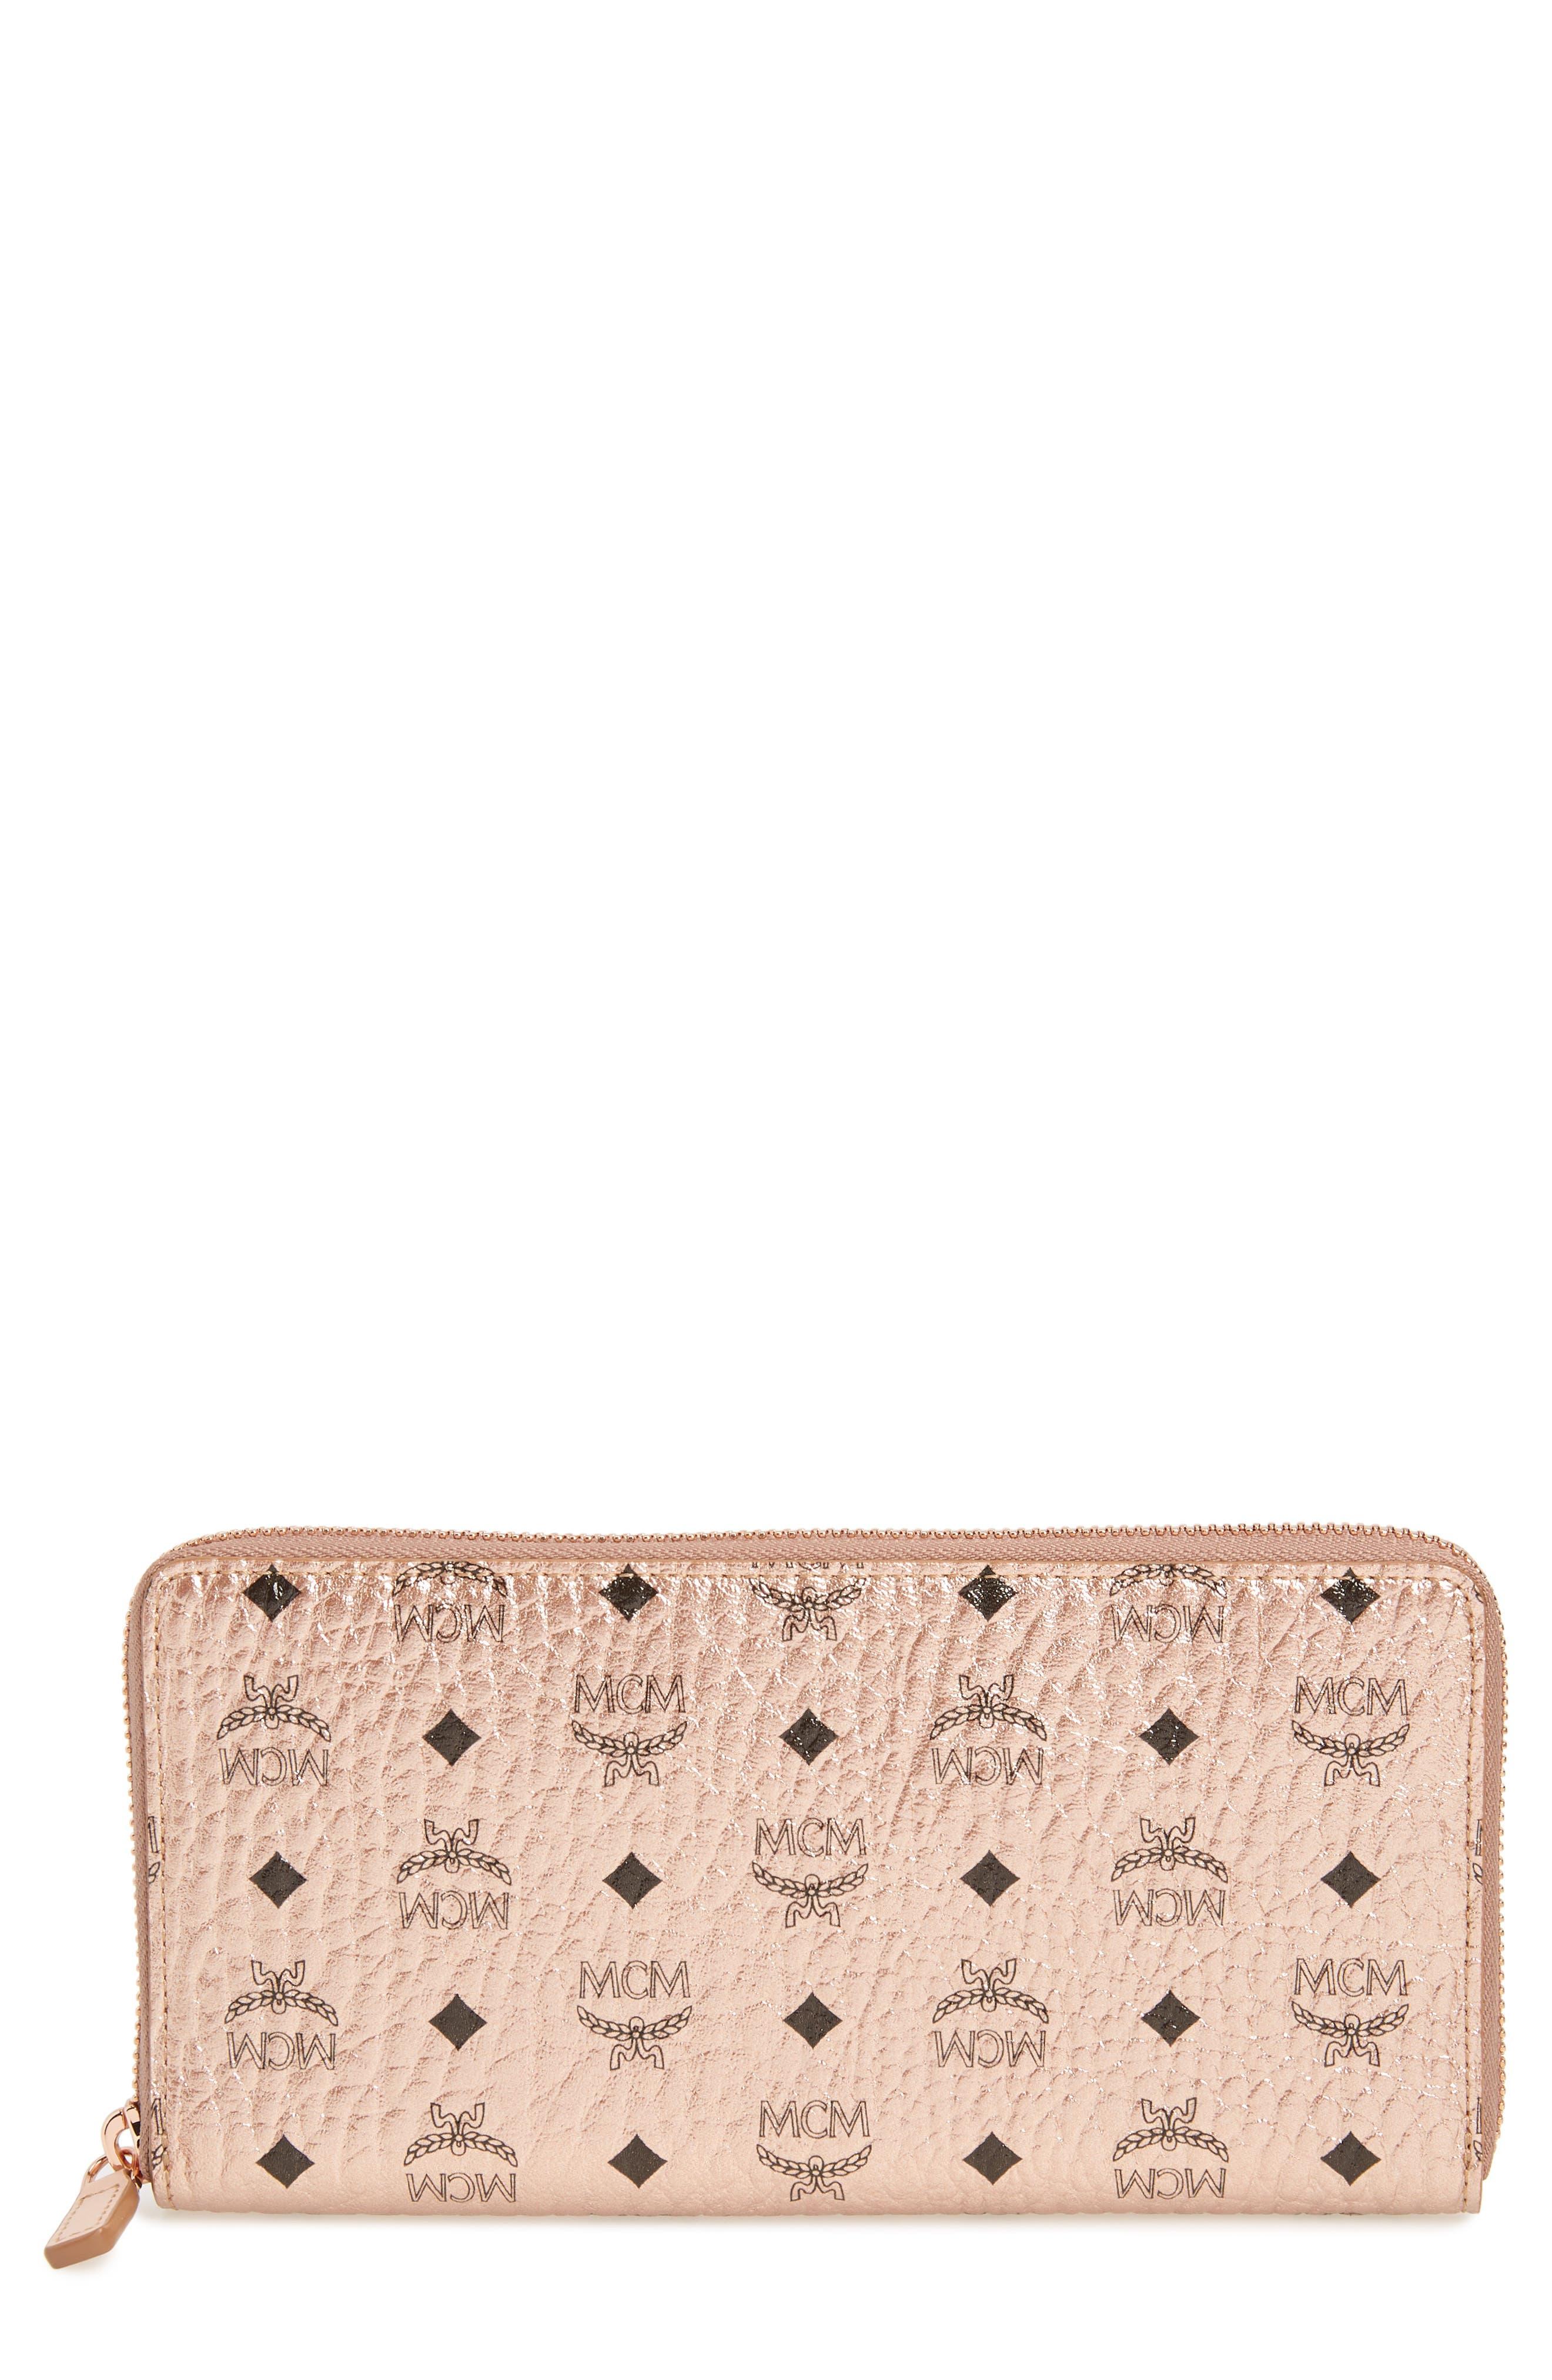 Visetos Original Zip Around Coated Canvas Wallet,                         Main,                         color, Champagne Gold